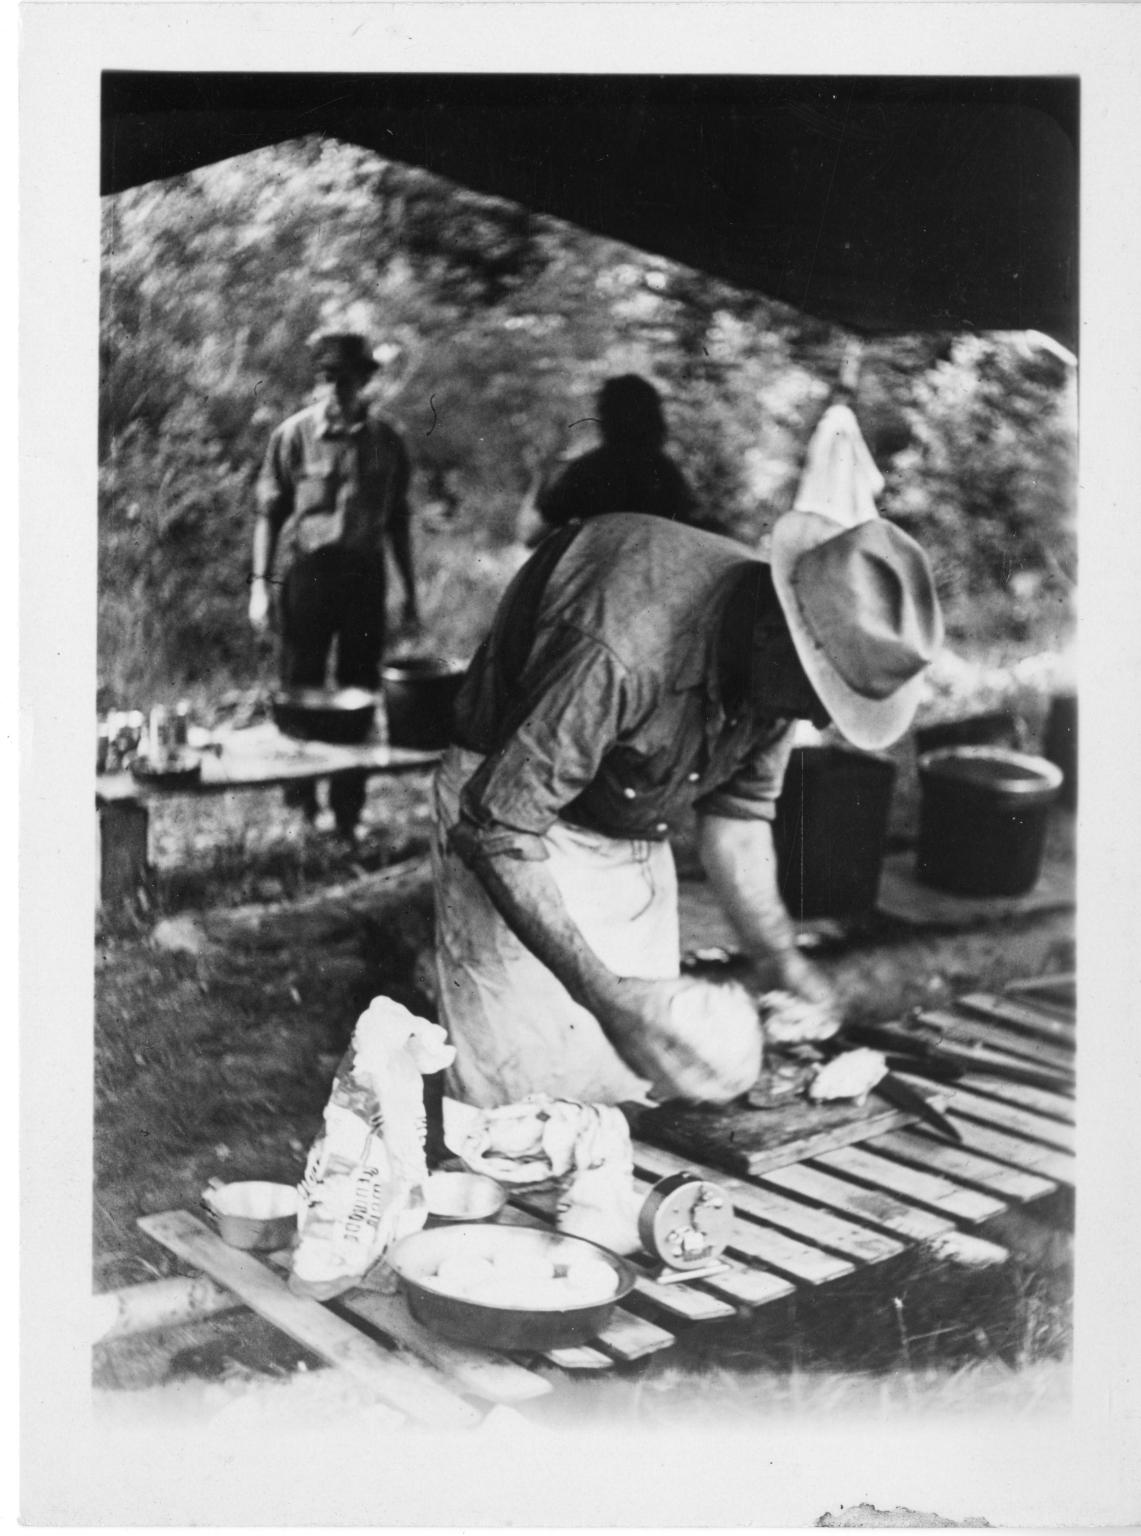 Camp cook